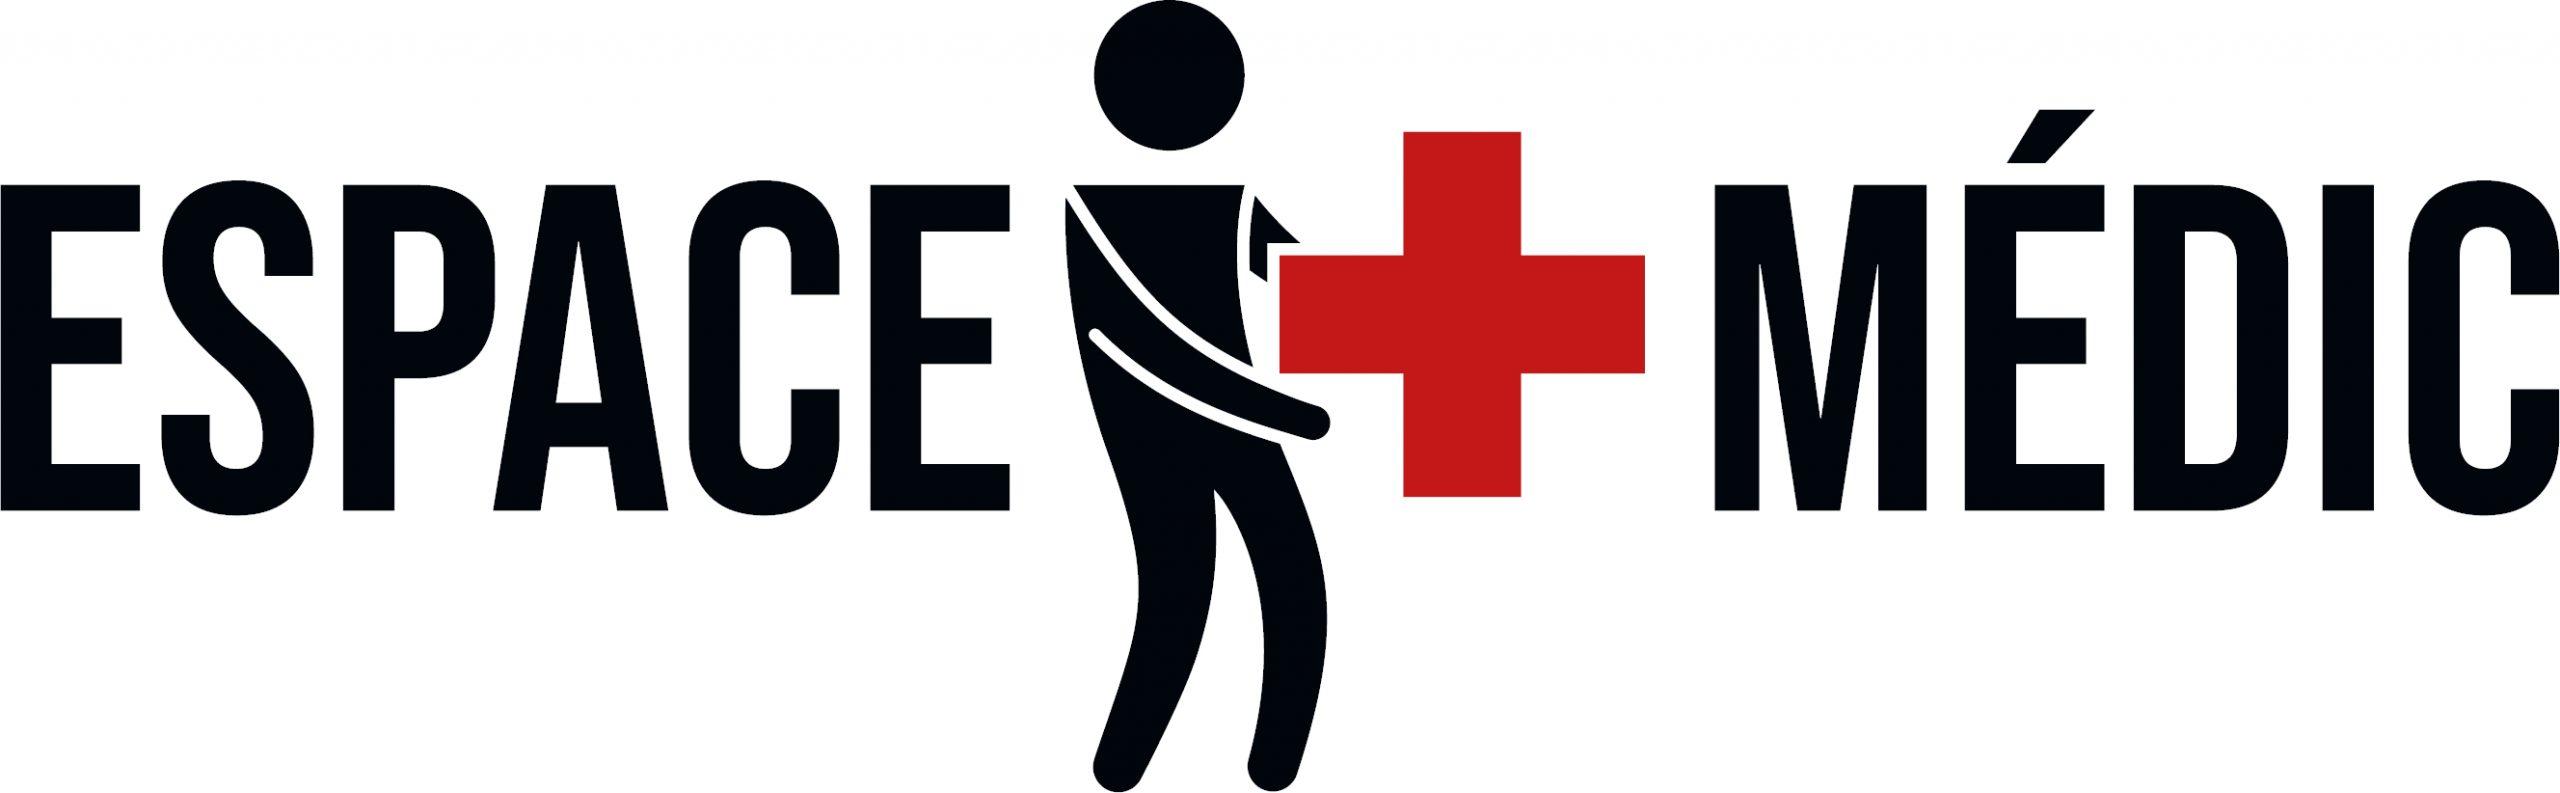 Espace+Médic s'adapte … évolue!